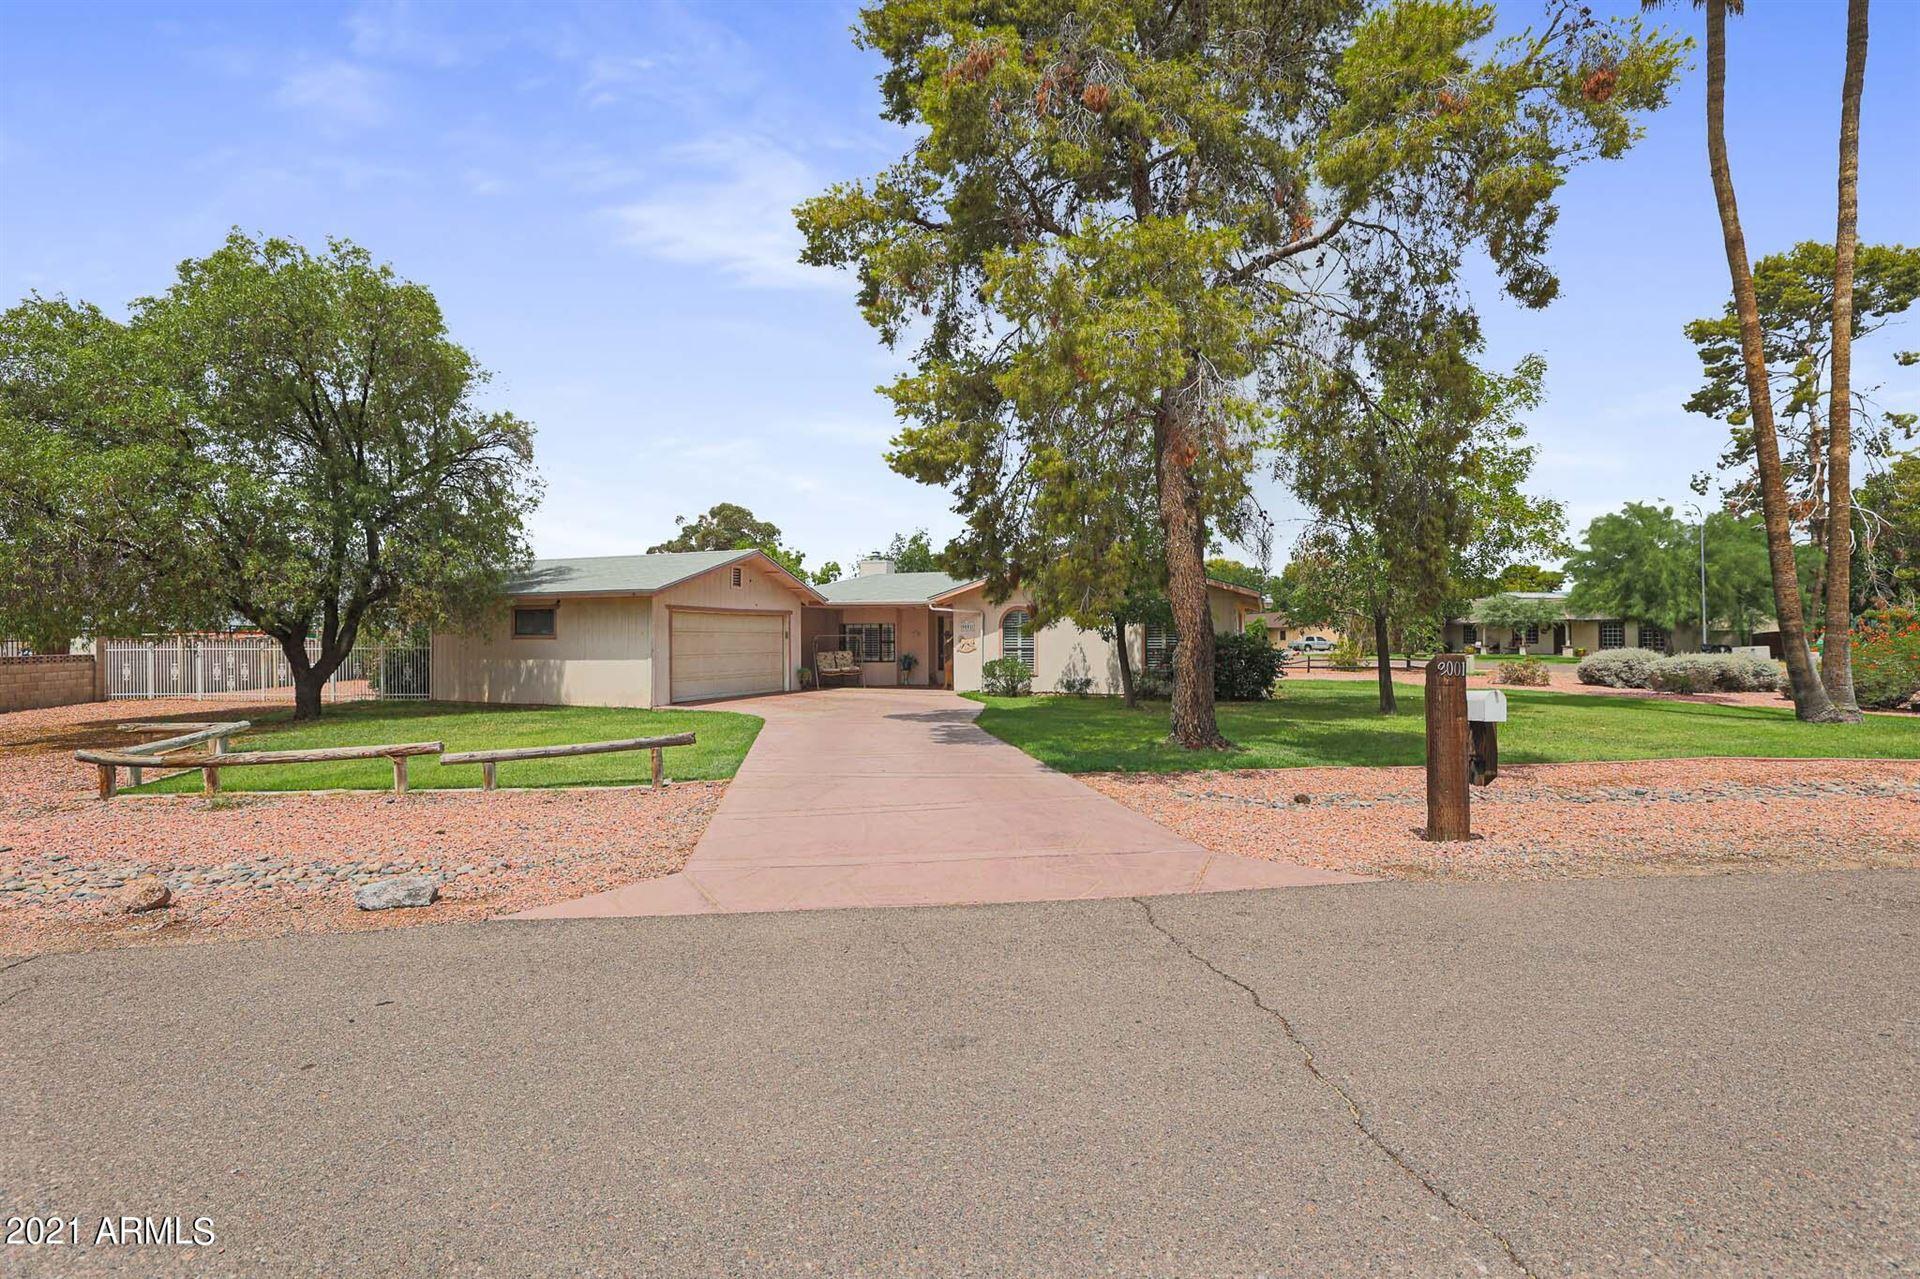 Photo of 9001 W Taylor Street, Tolleson, AZ 85353 (MLS # 6262677)